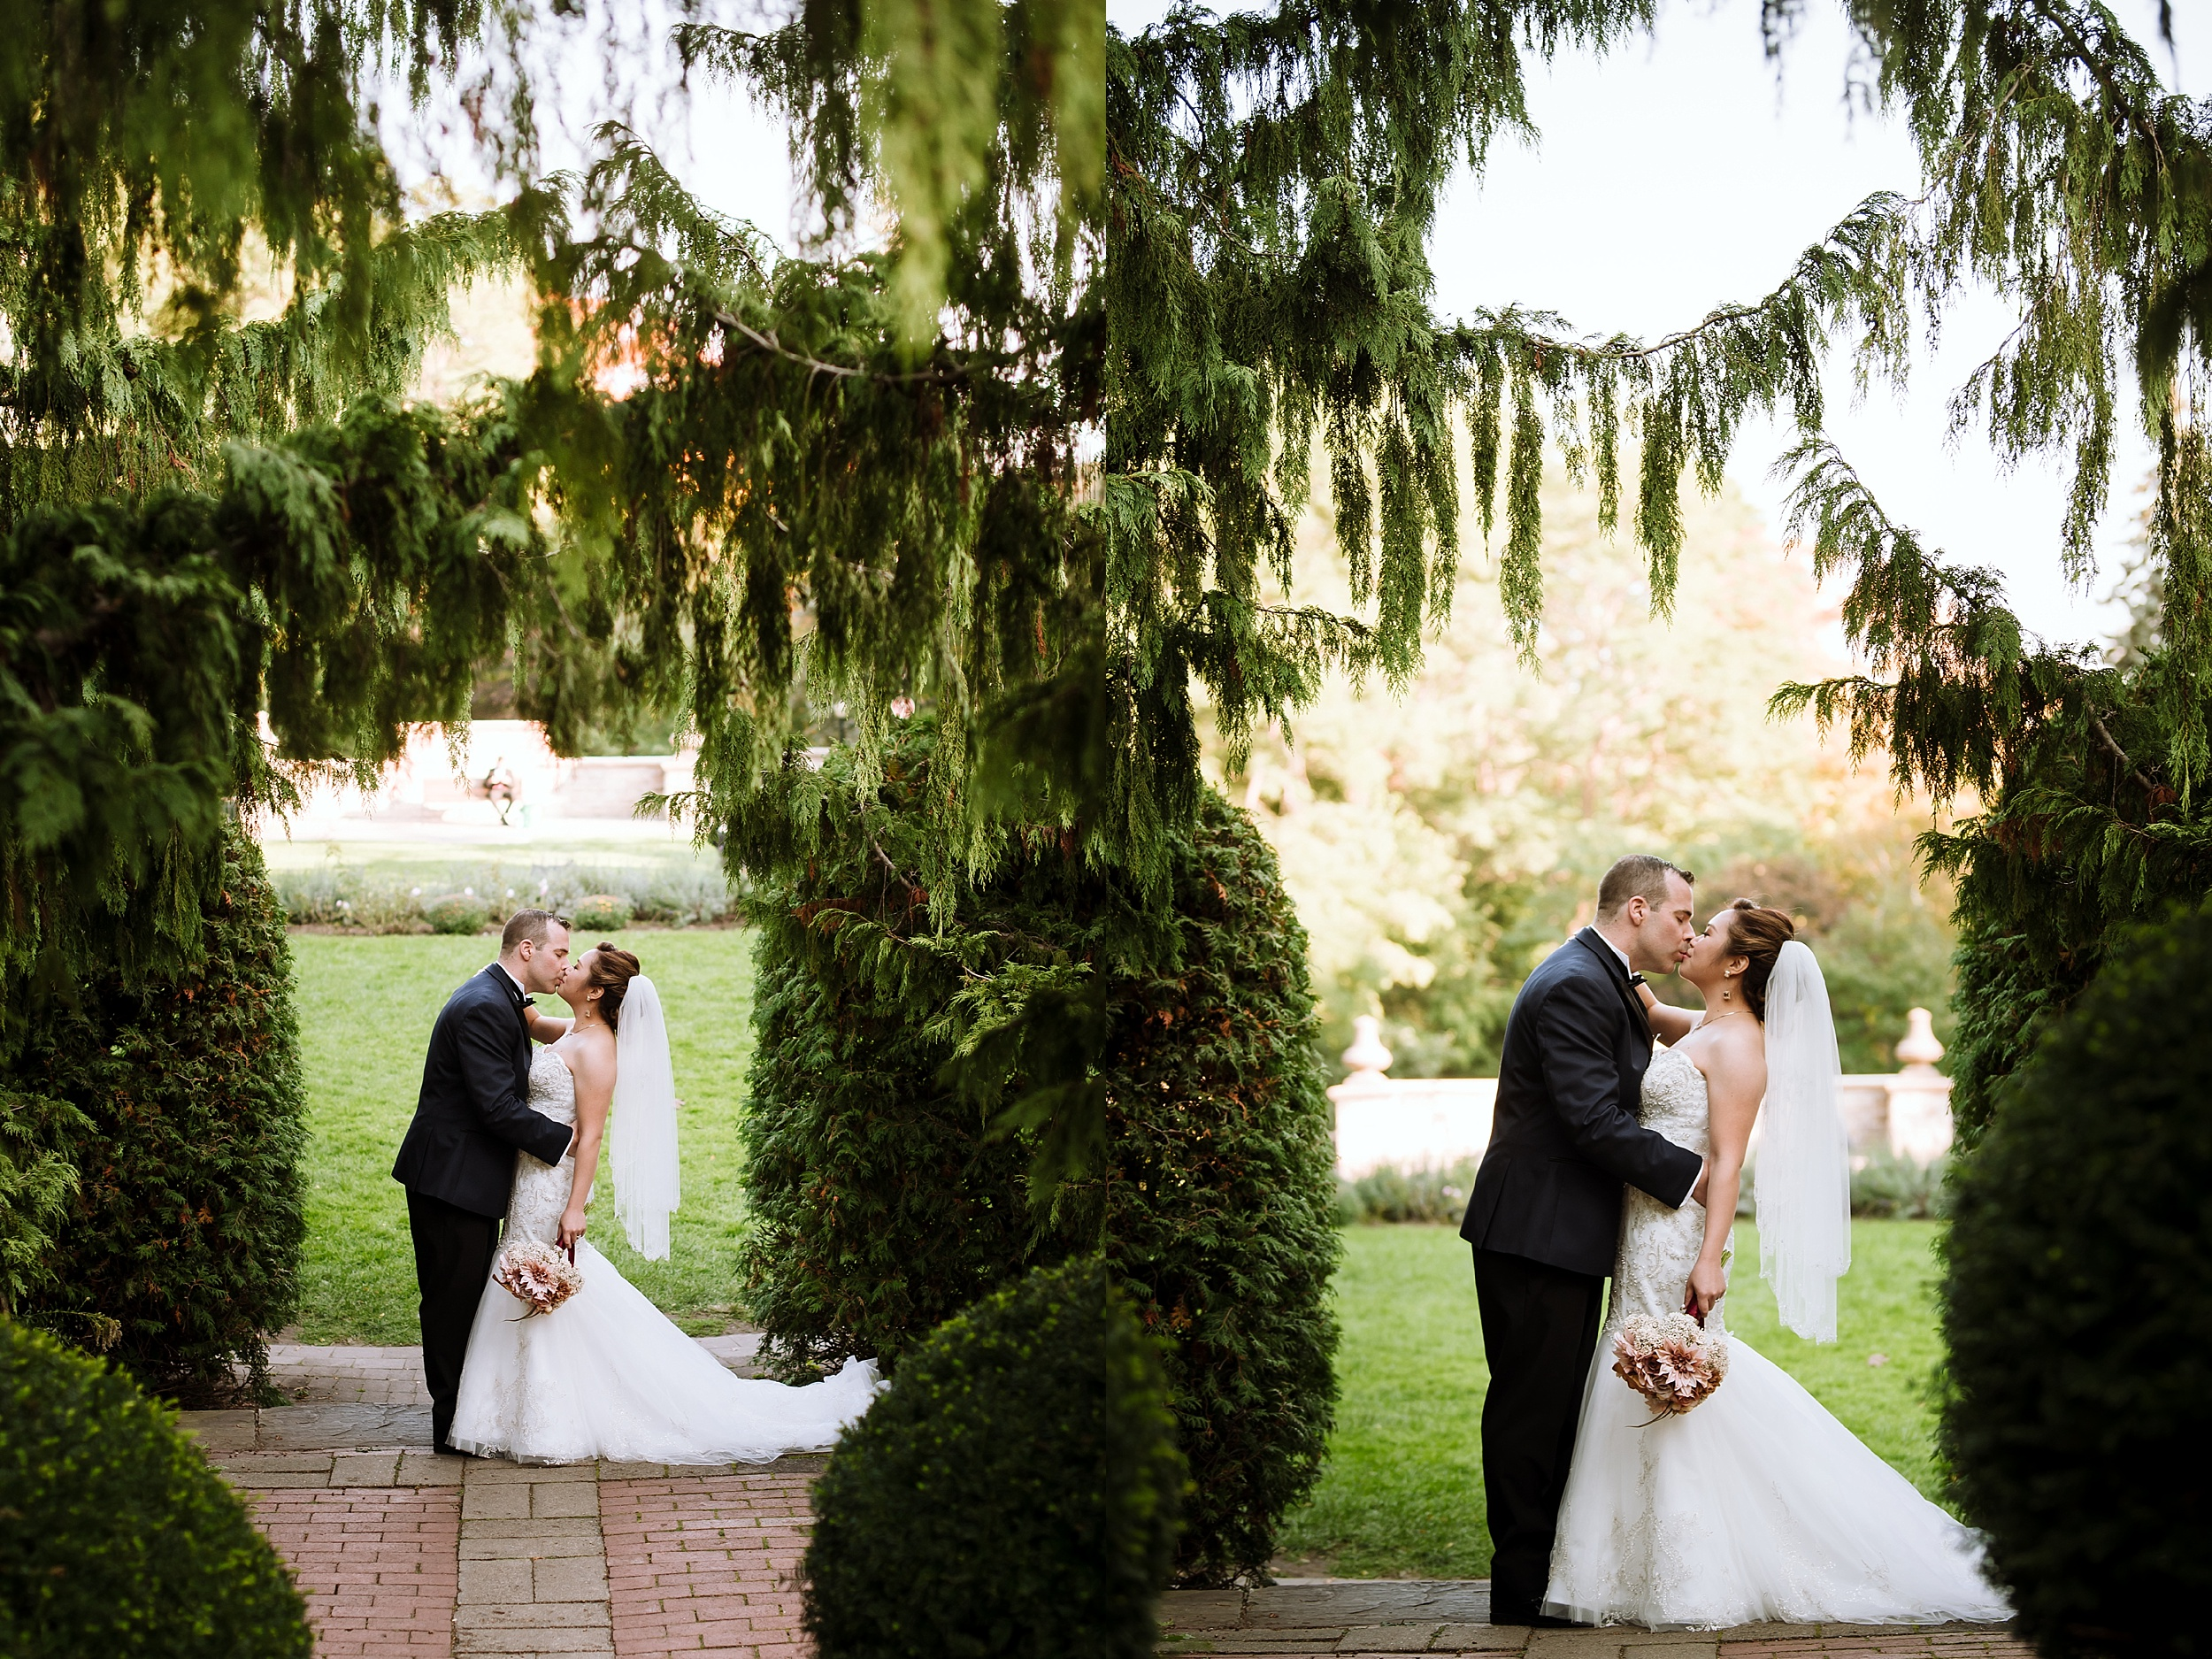 Sunnybrook_Estates_Alexander_Muir_Toronto_Wedding_Photographer_0016.jpg